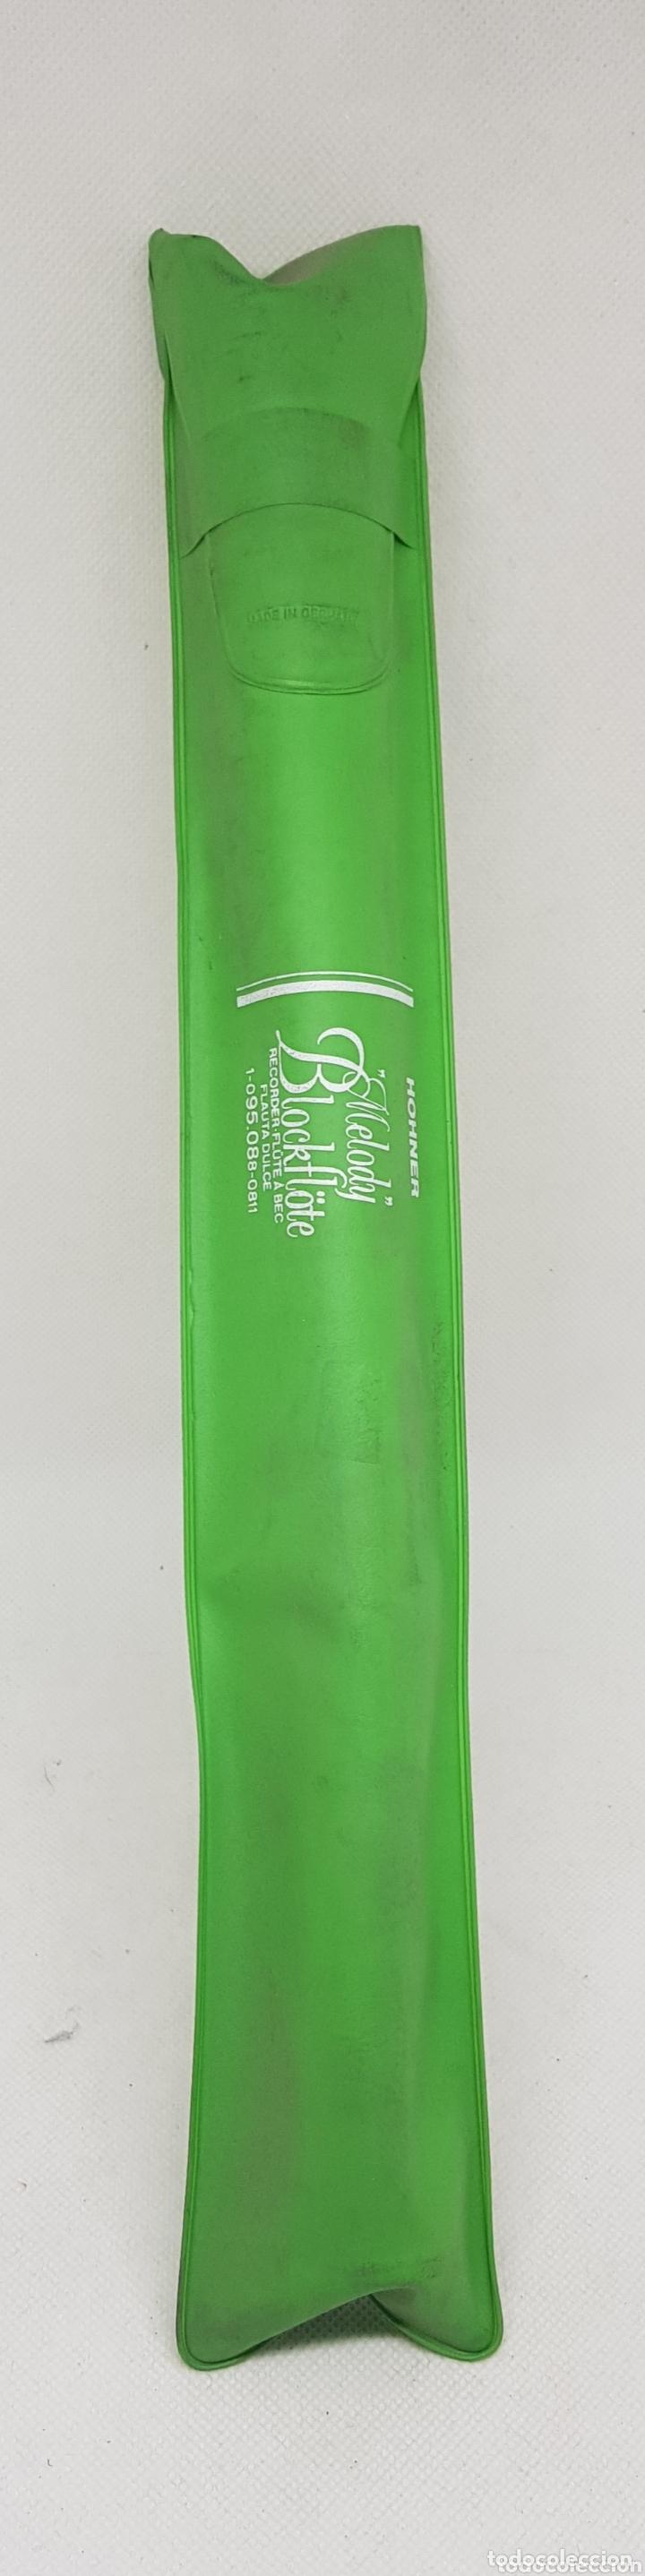 Instrumentos musicales: Flauta dulce honner - nunca usada - car157 - Foto 3 - 173860190